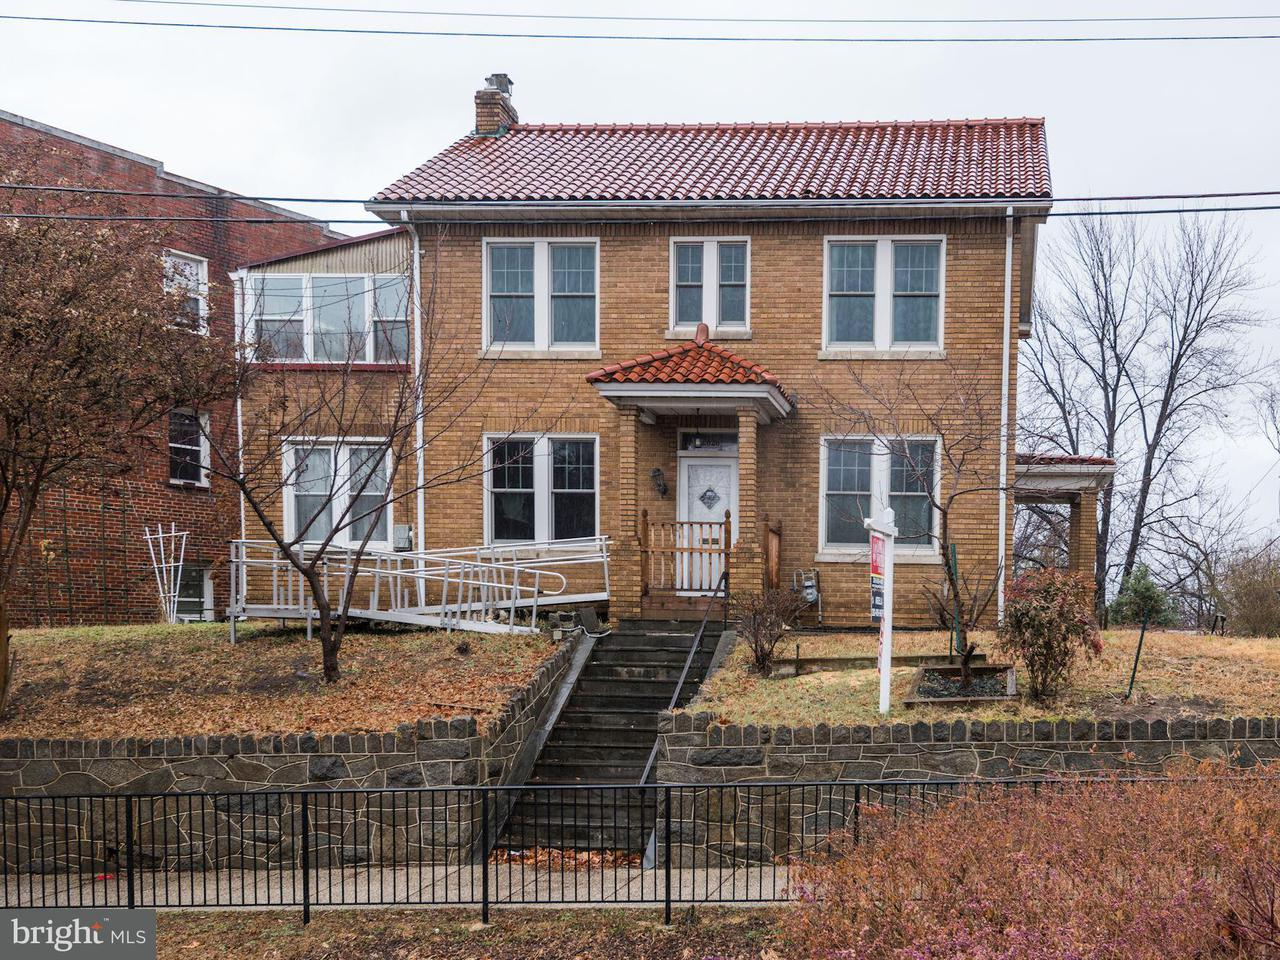 Single Family Home for Sale at 2826 Pennsylvania Ave Se 2826 Pennsylvania Ave Se Washington, District Of Columbia 20020 United States